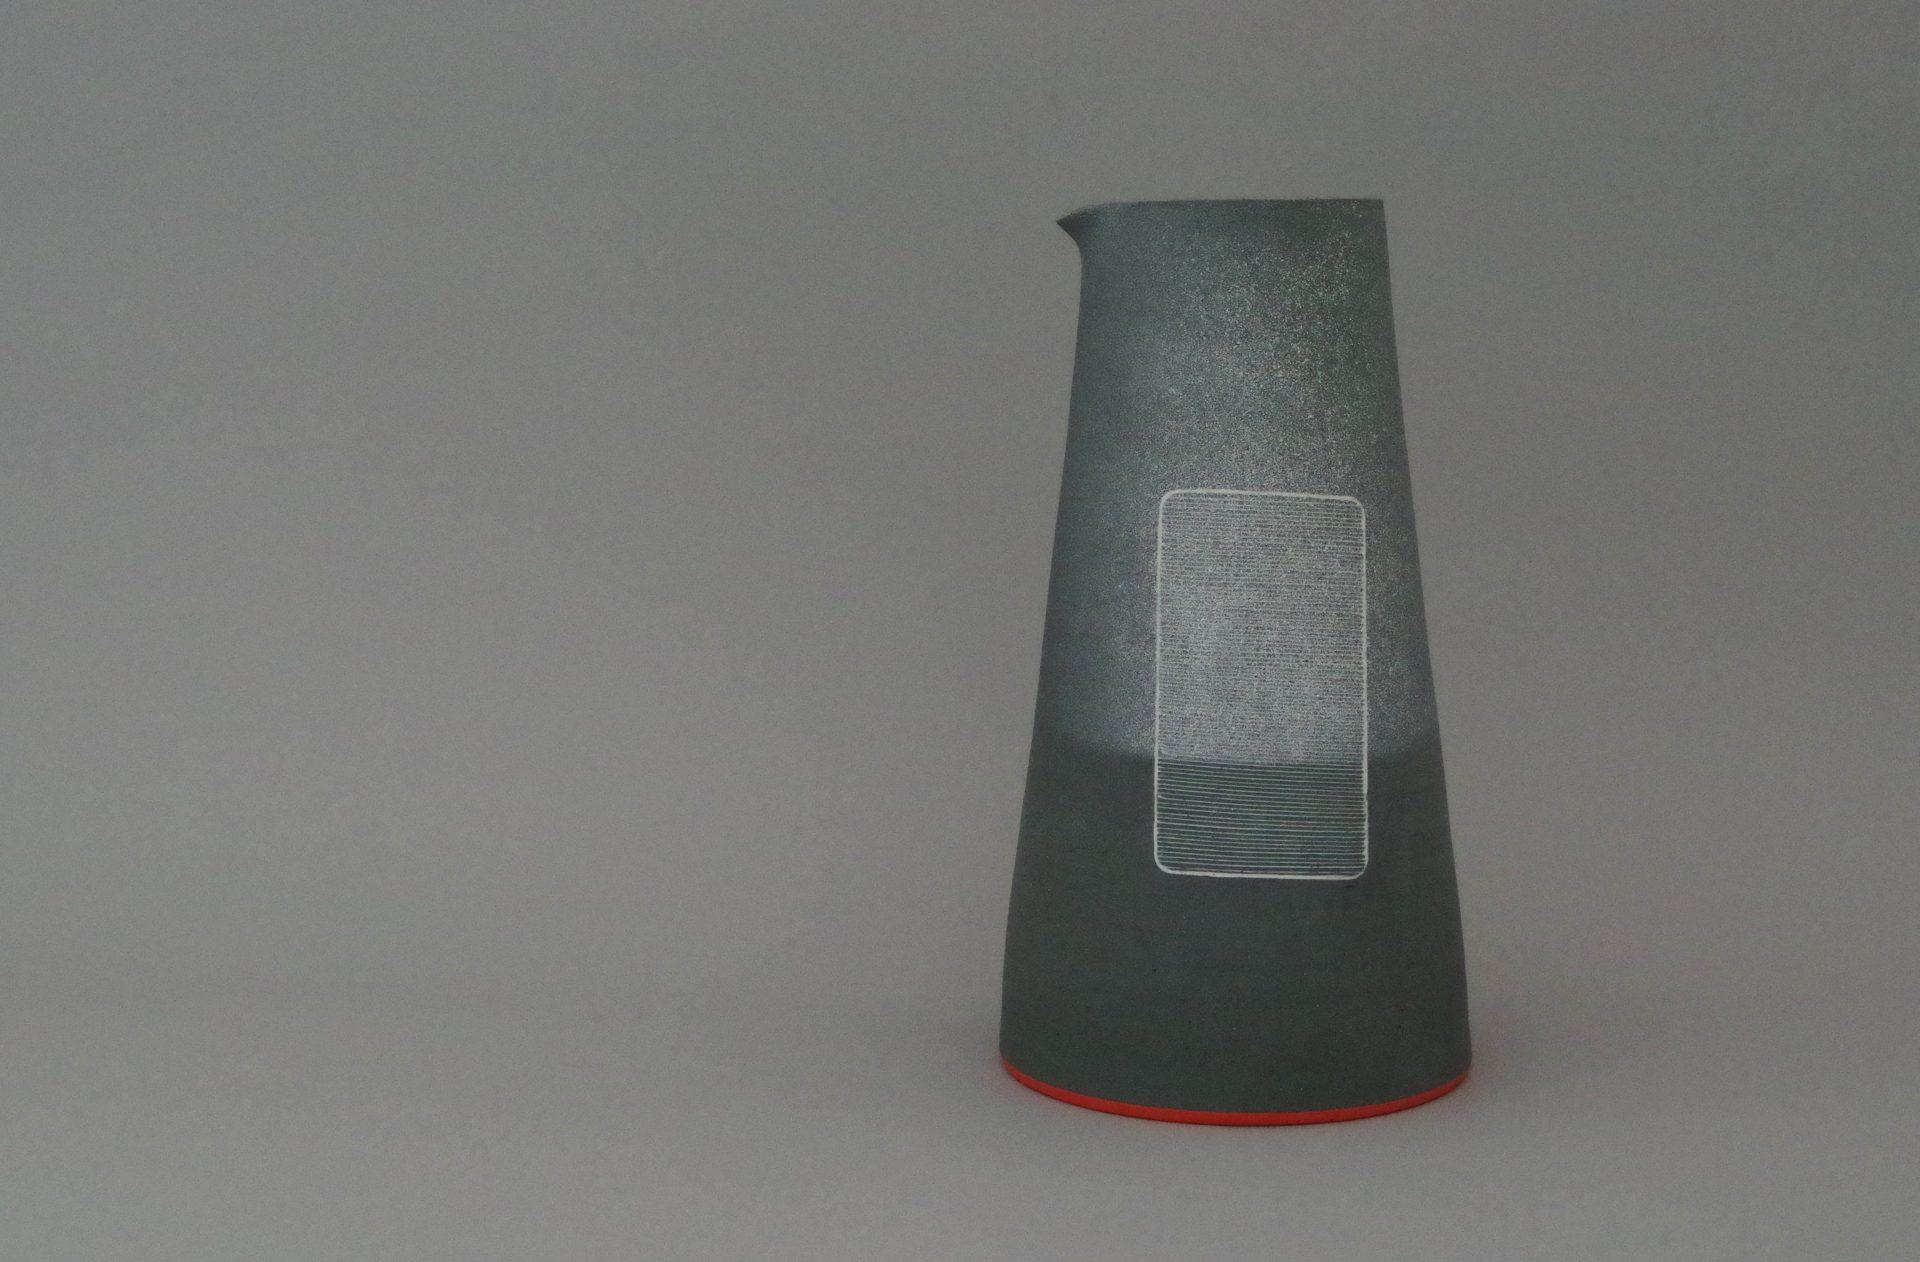 #102 fine mist grille Jan 15 h. 25cm